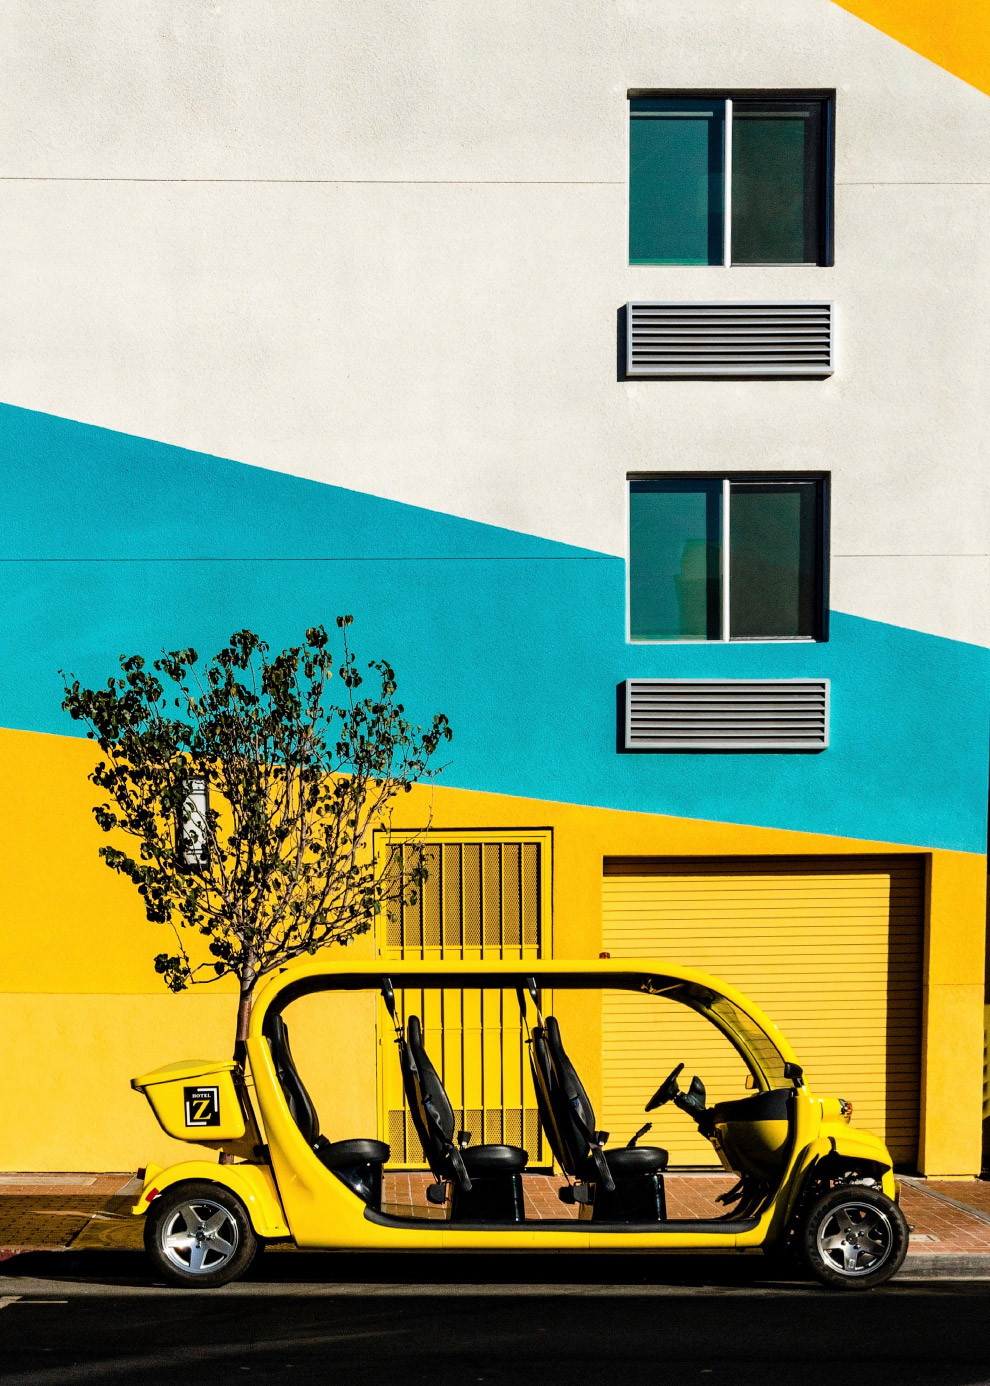 Картинки по запросу «Городской дворец» © Kuanglong Zhang